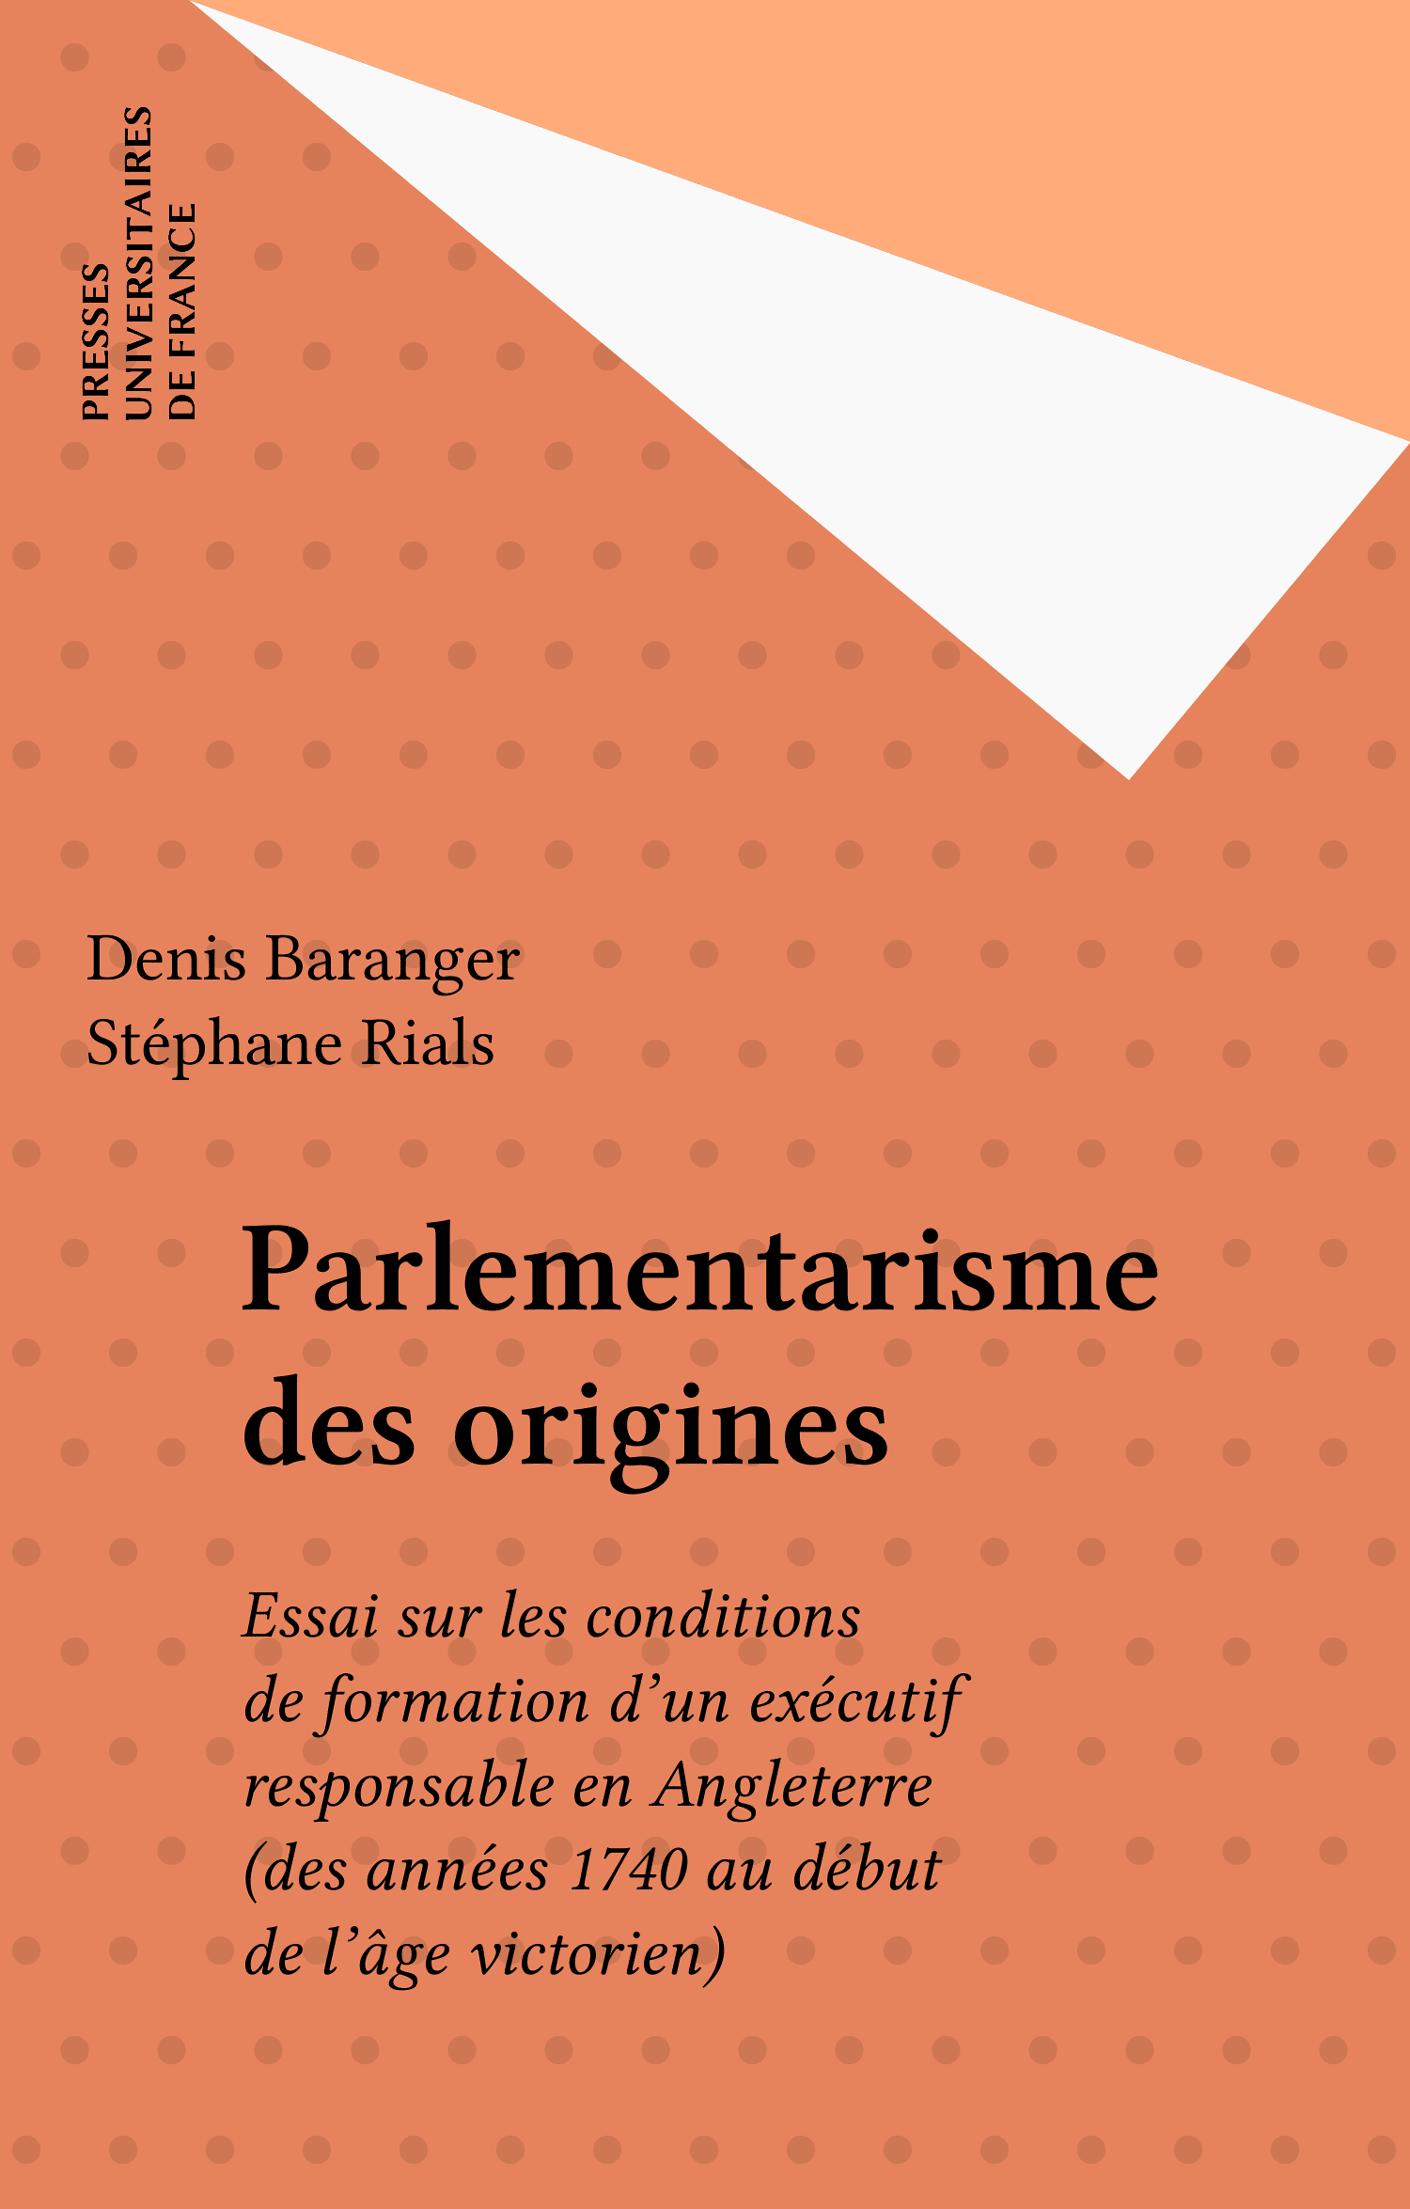 Parlementarisme des origines